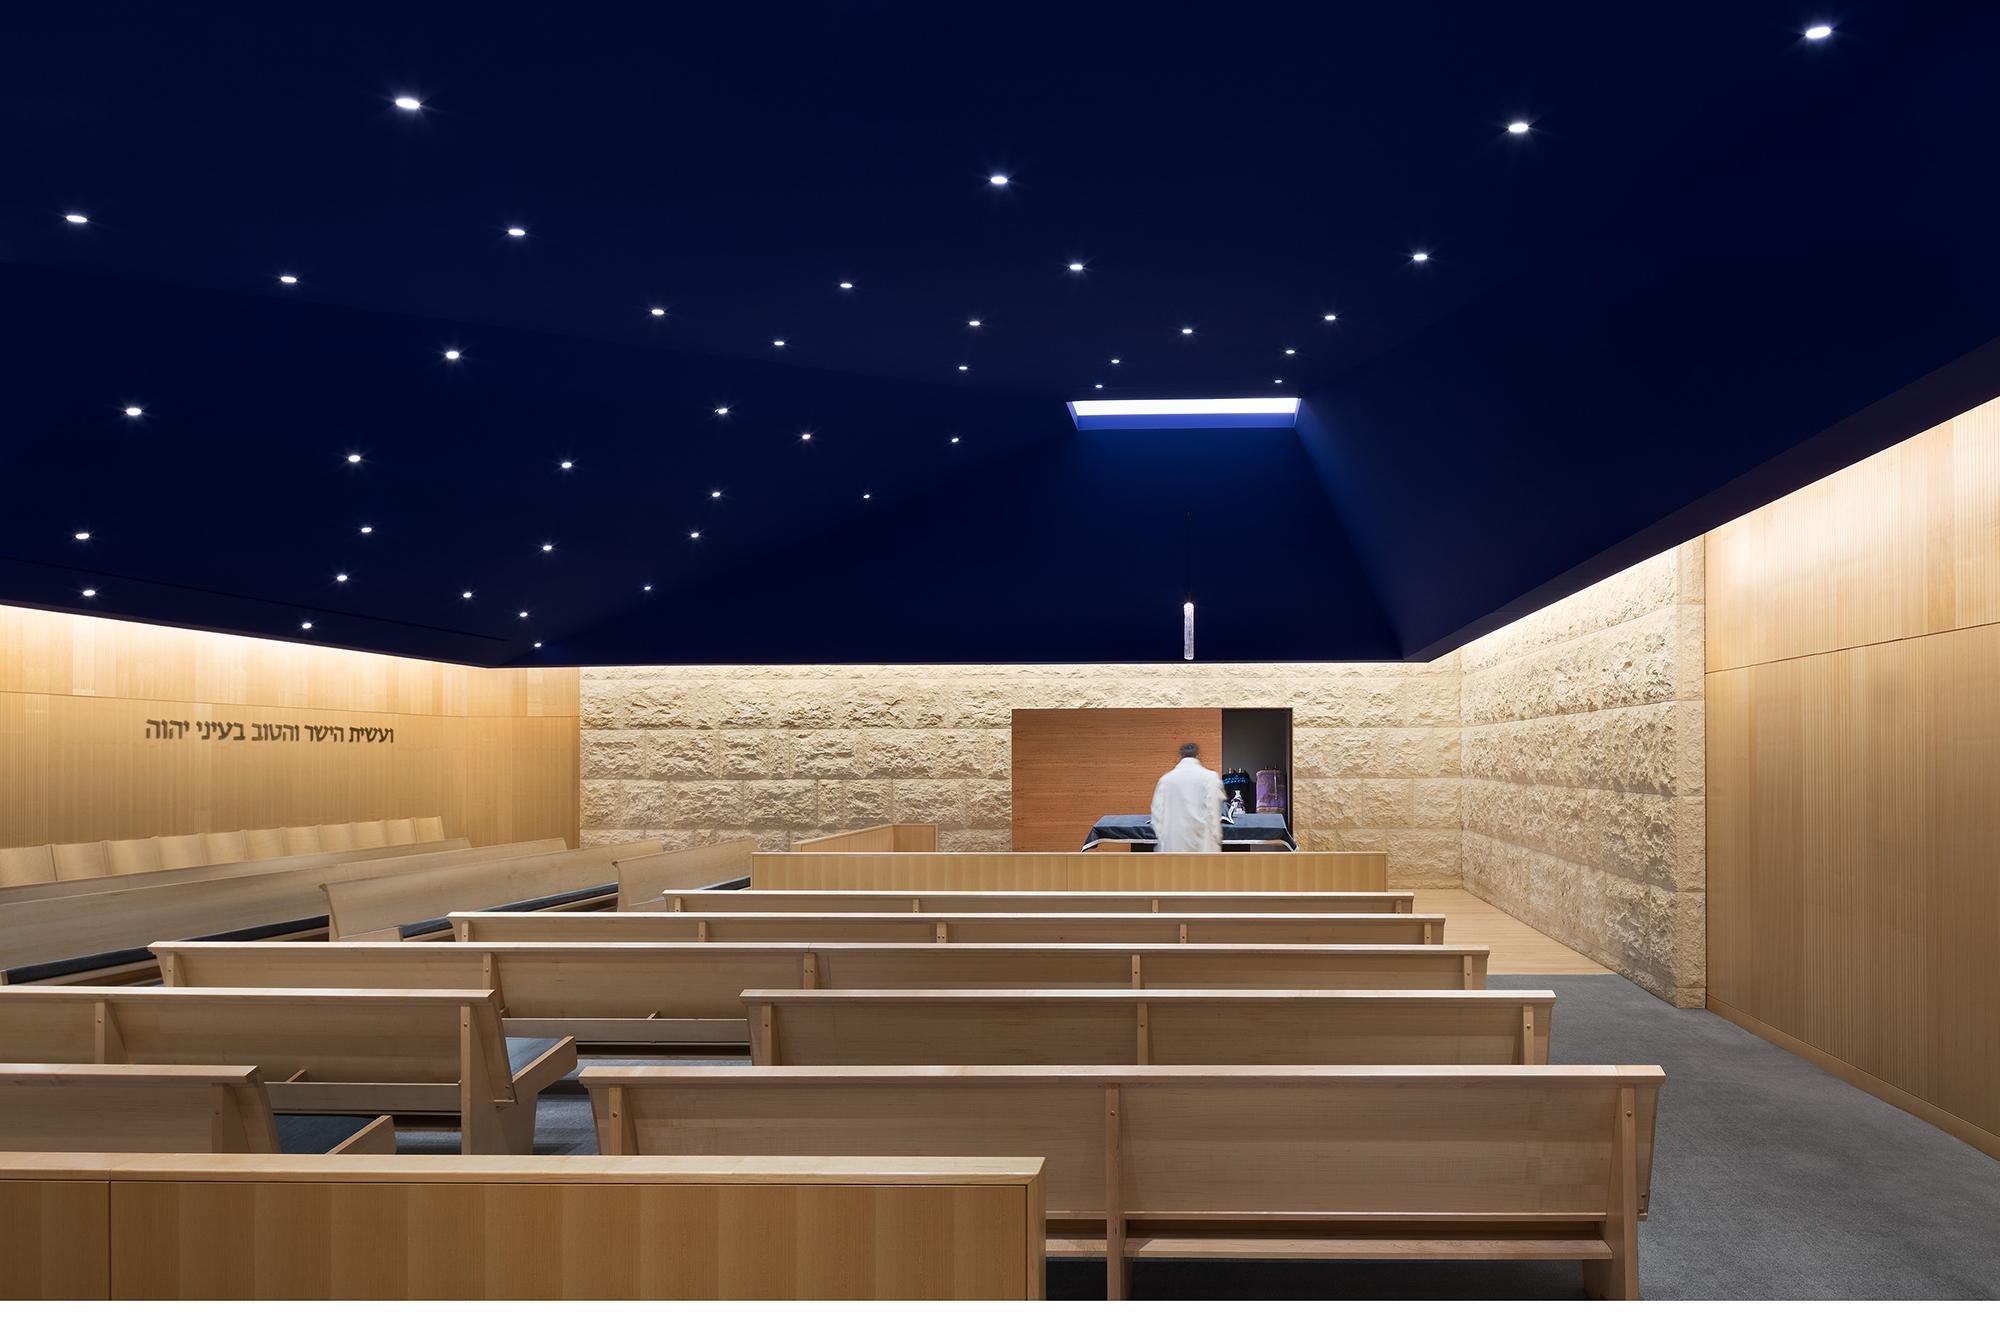 Gymnasium design standards